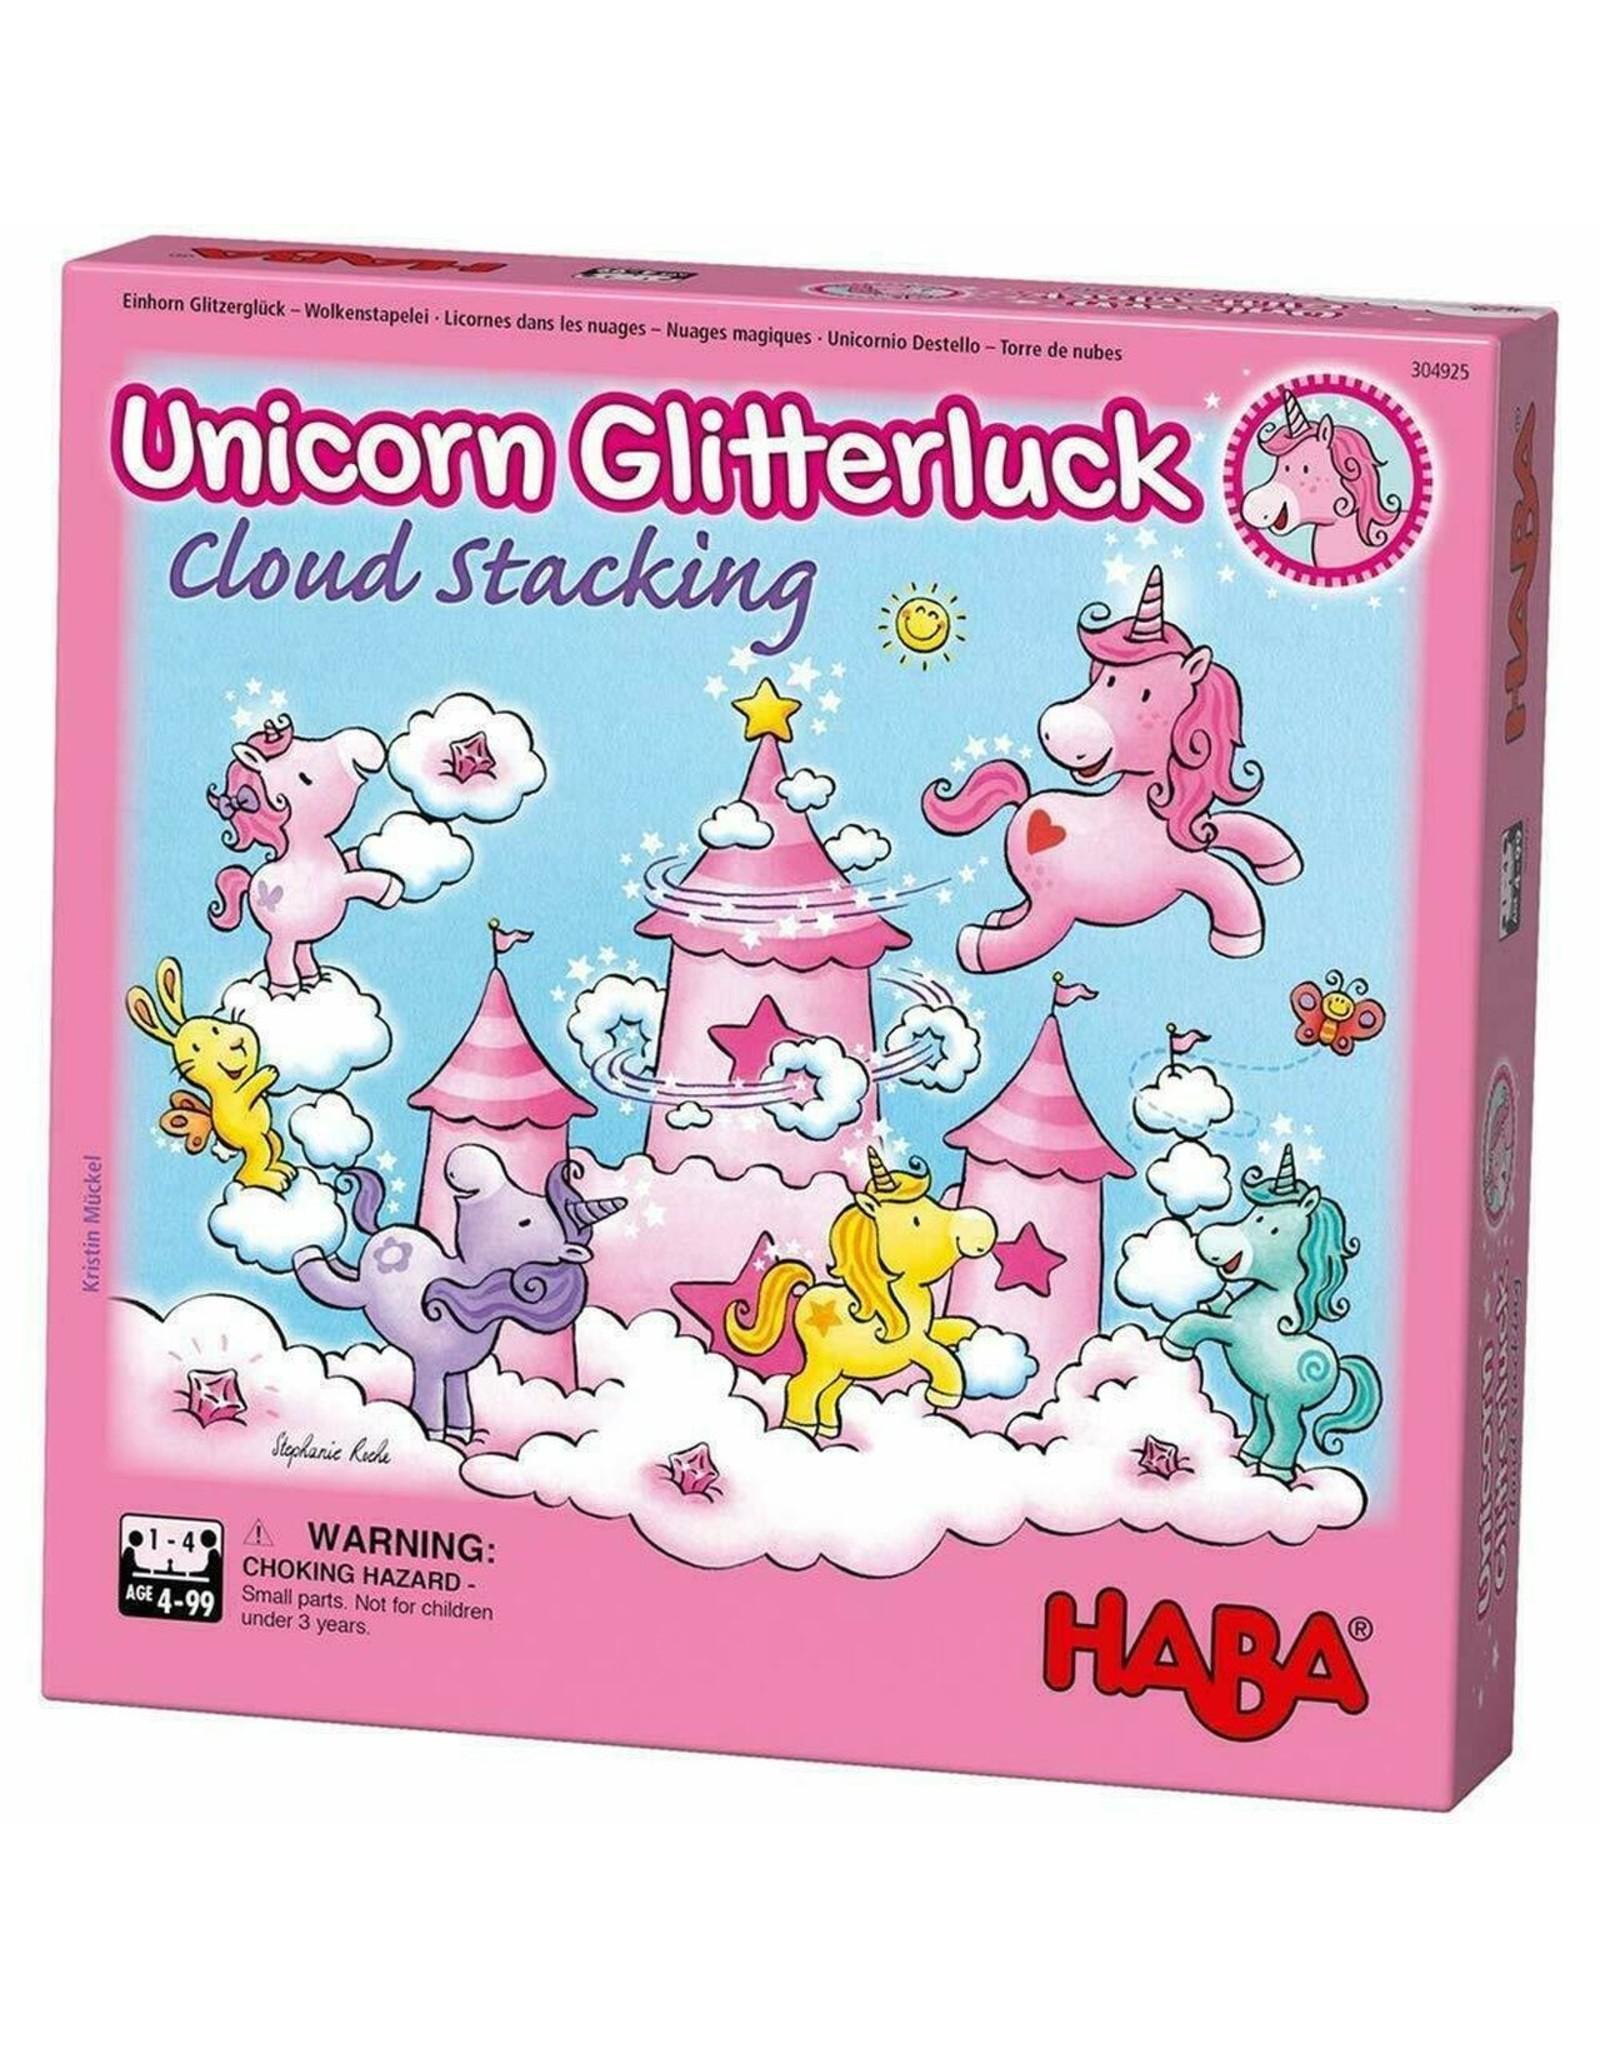 Haba USA Unicorn Glitterluck: Cloud Stacking Game